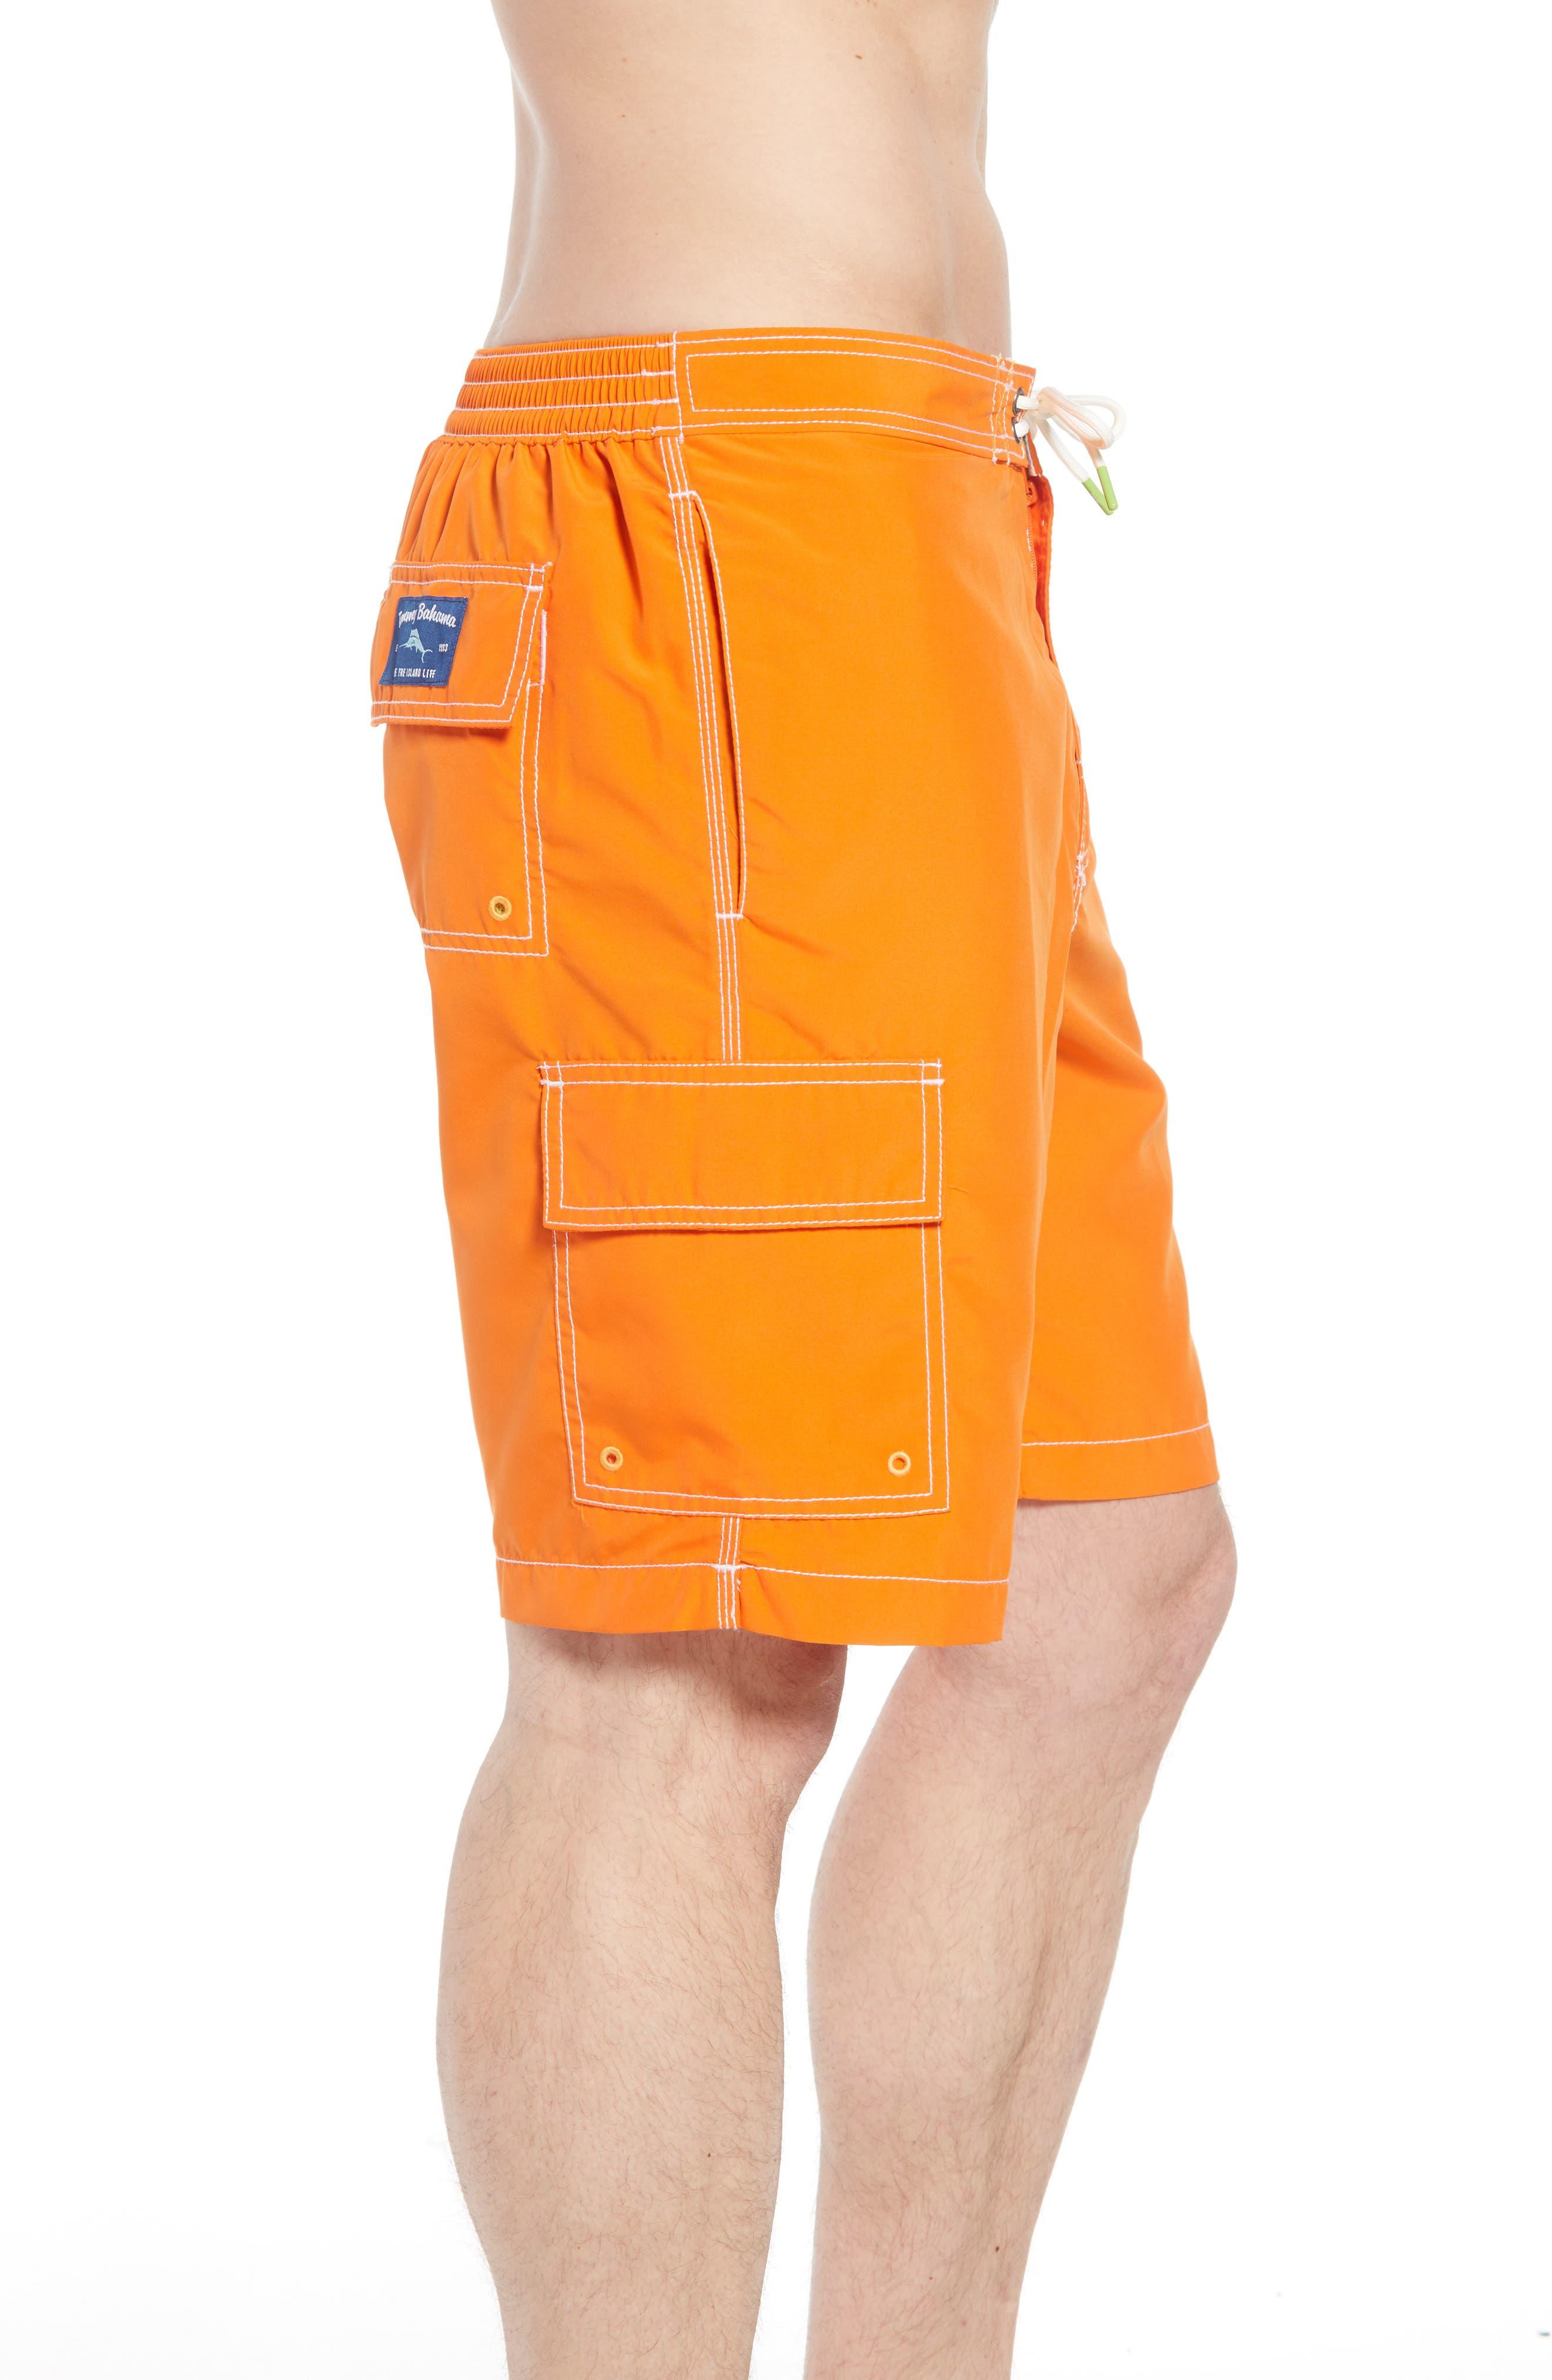 Baja Beach Board Shorts,                             Alternate thumbnail 4, color,                             Curuba